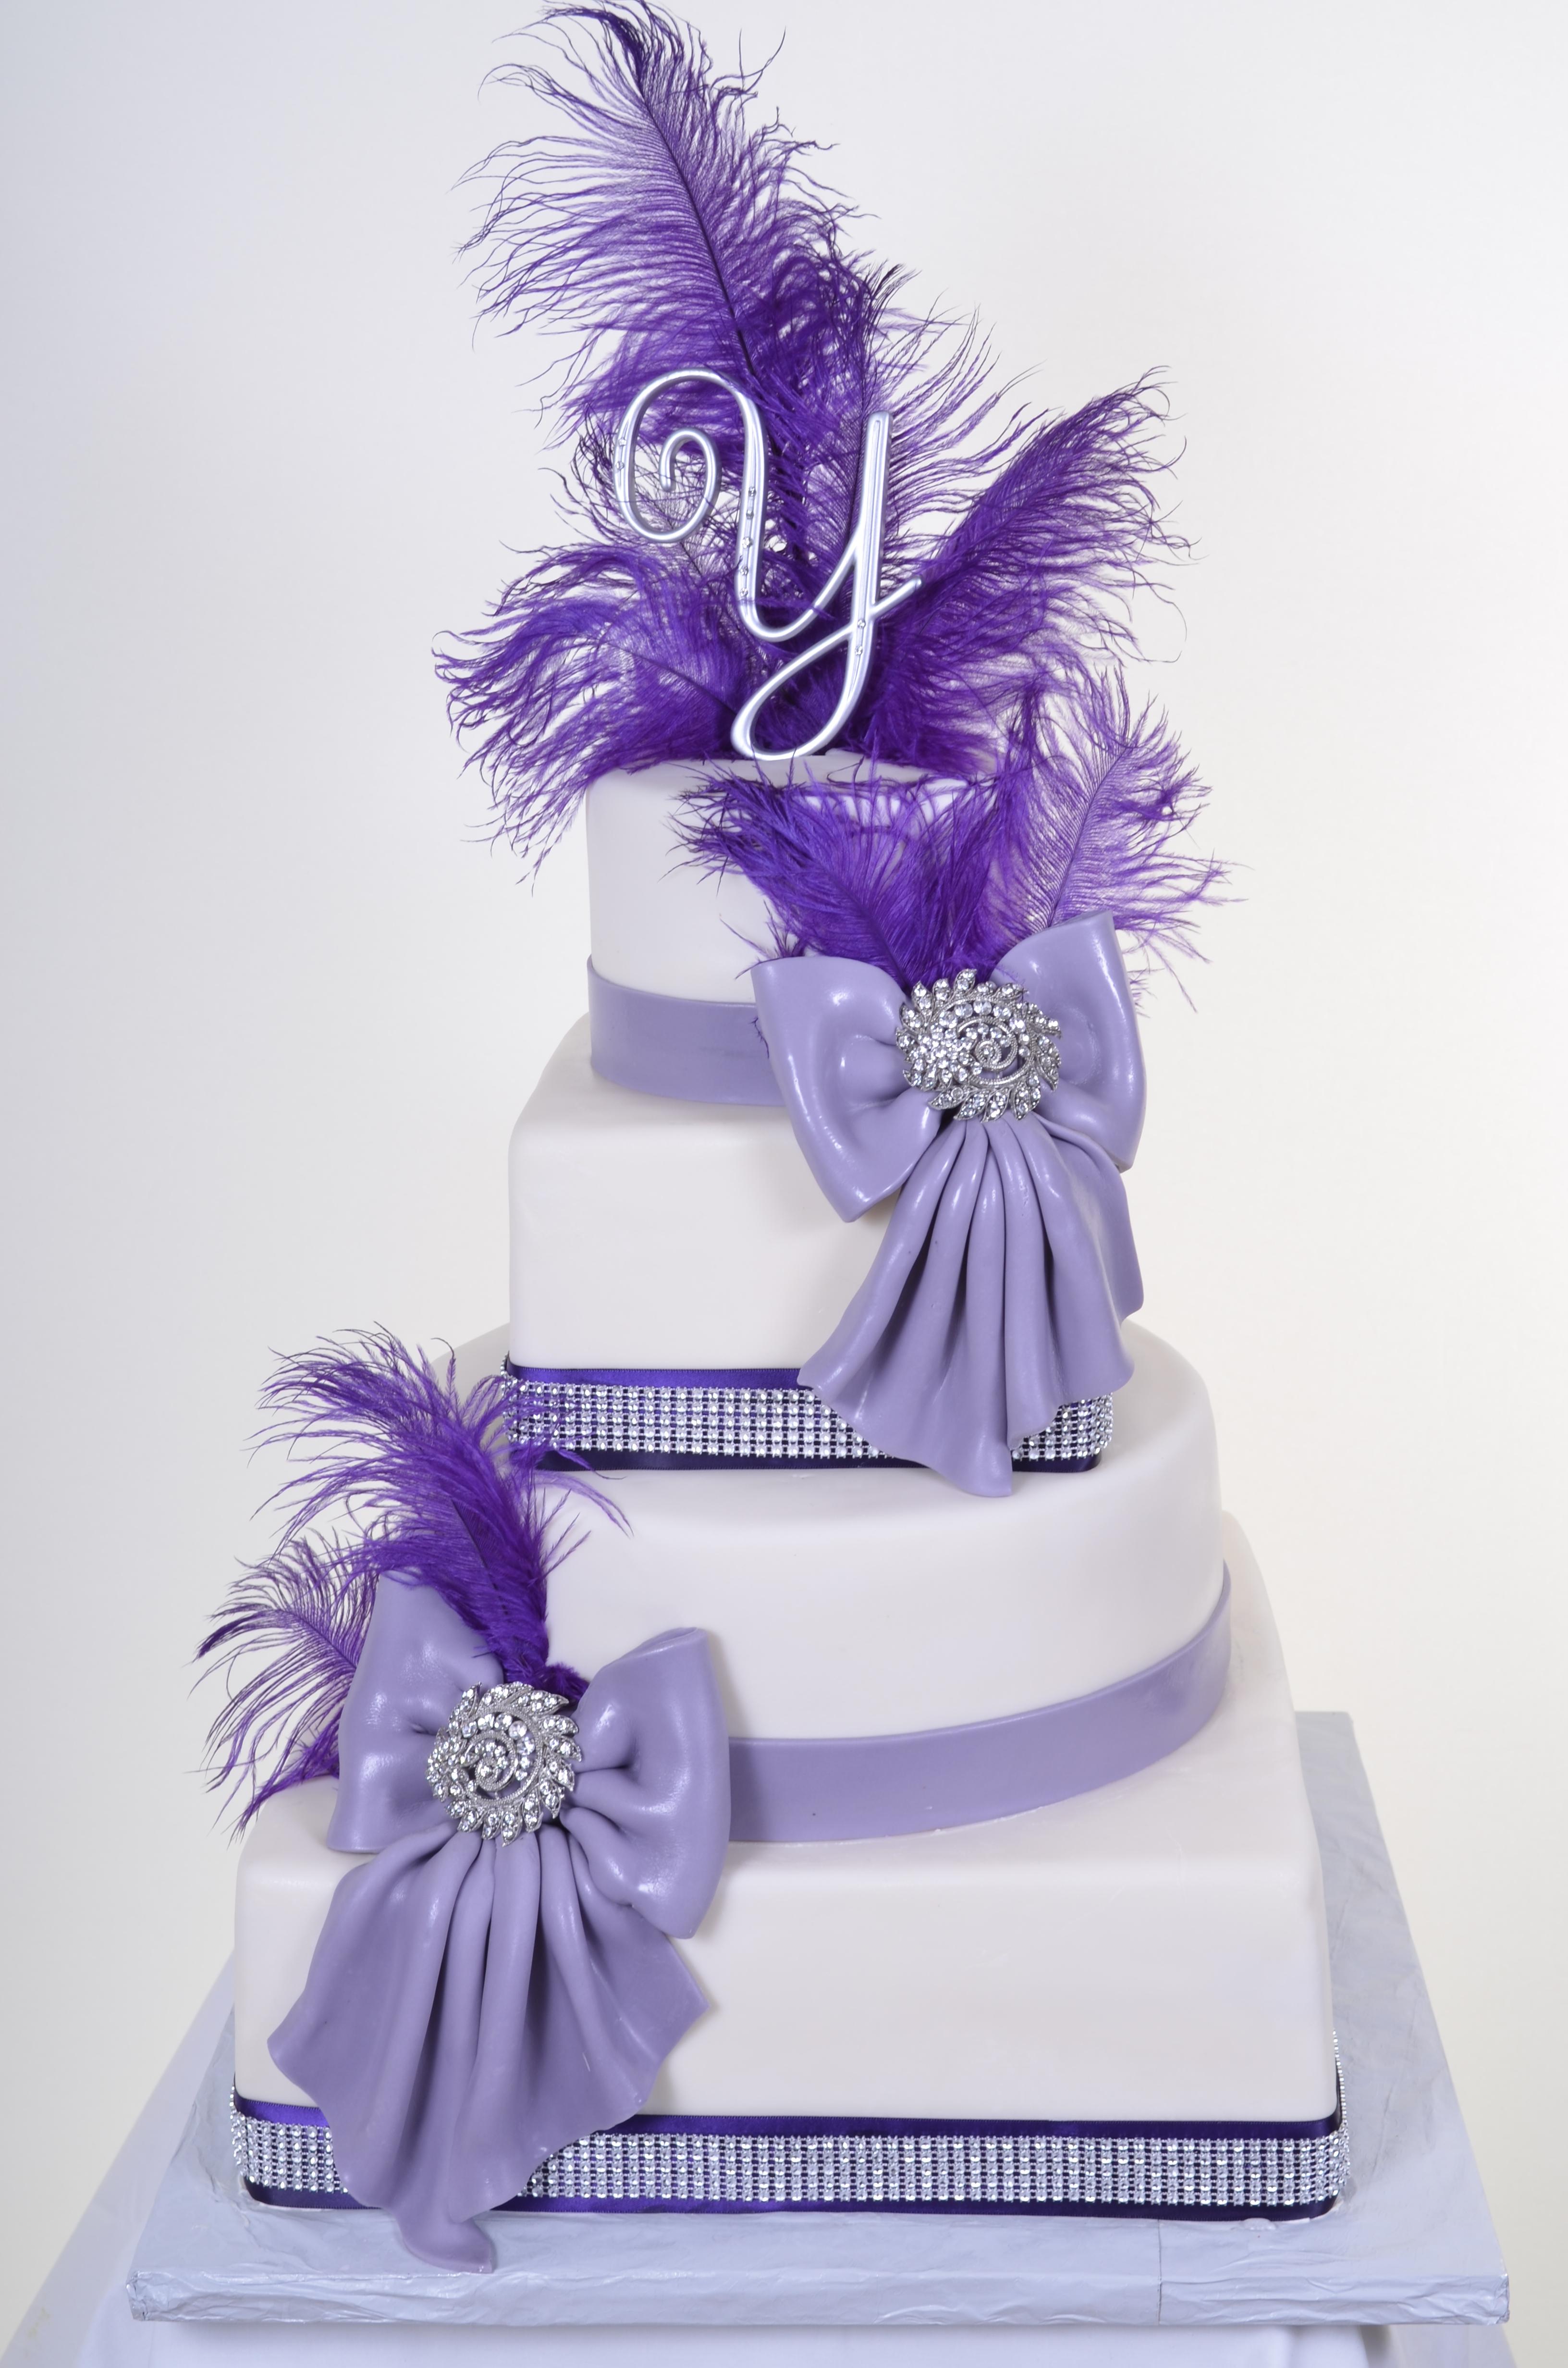 Pastry Palace Las Vegas Wedding Cake 906 - Feathers & Bows